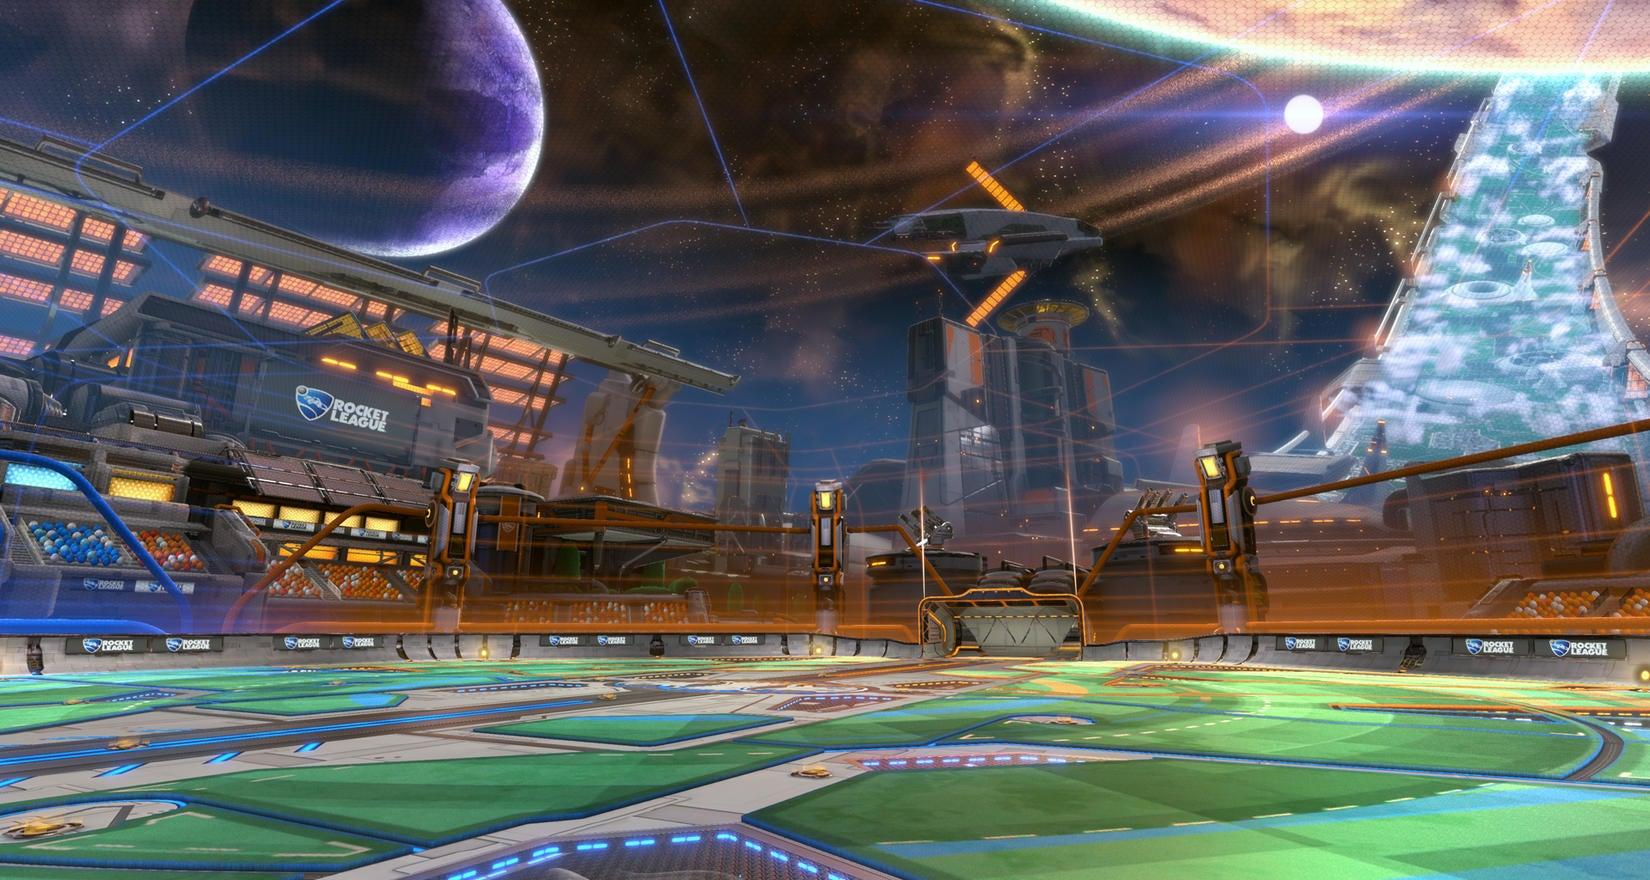 Starbase ARC Blasts Off December 7 Image